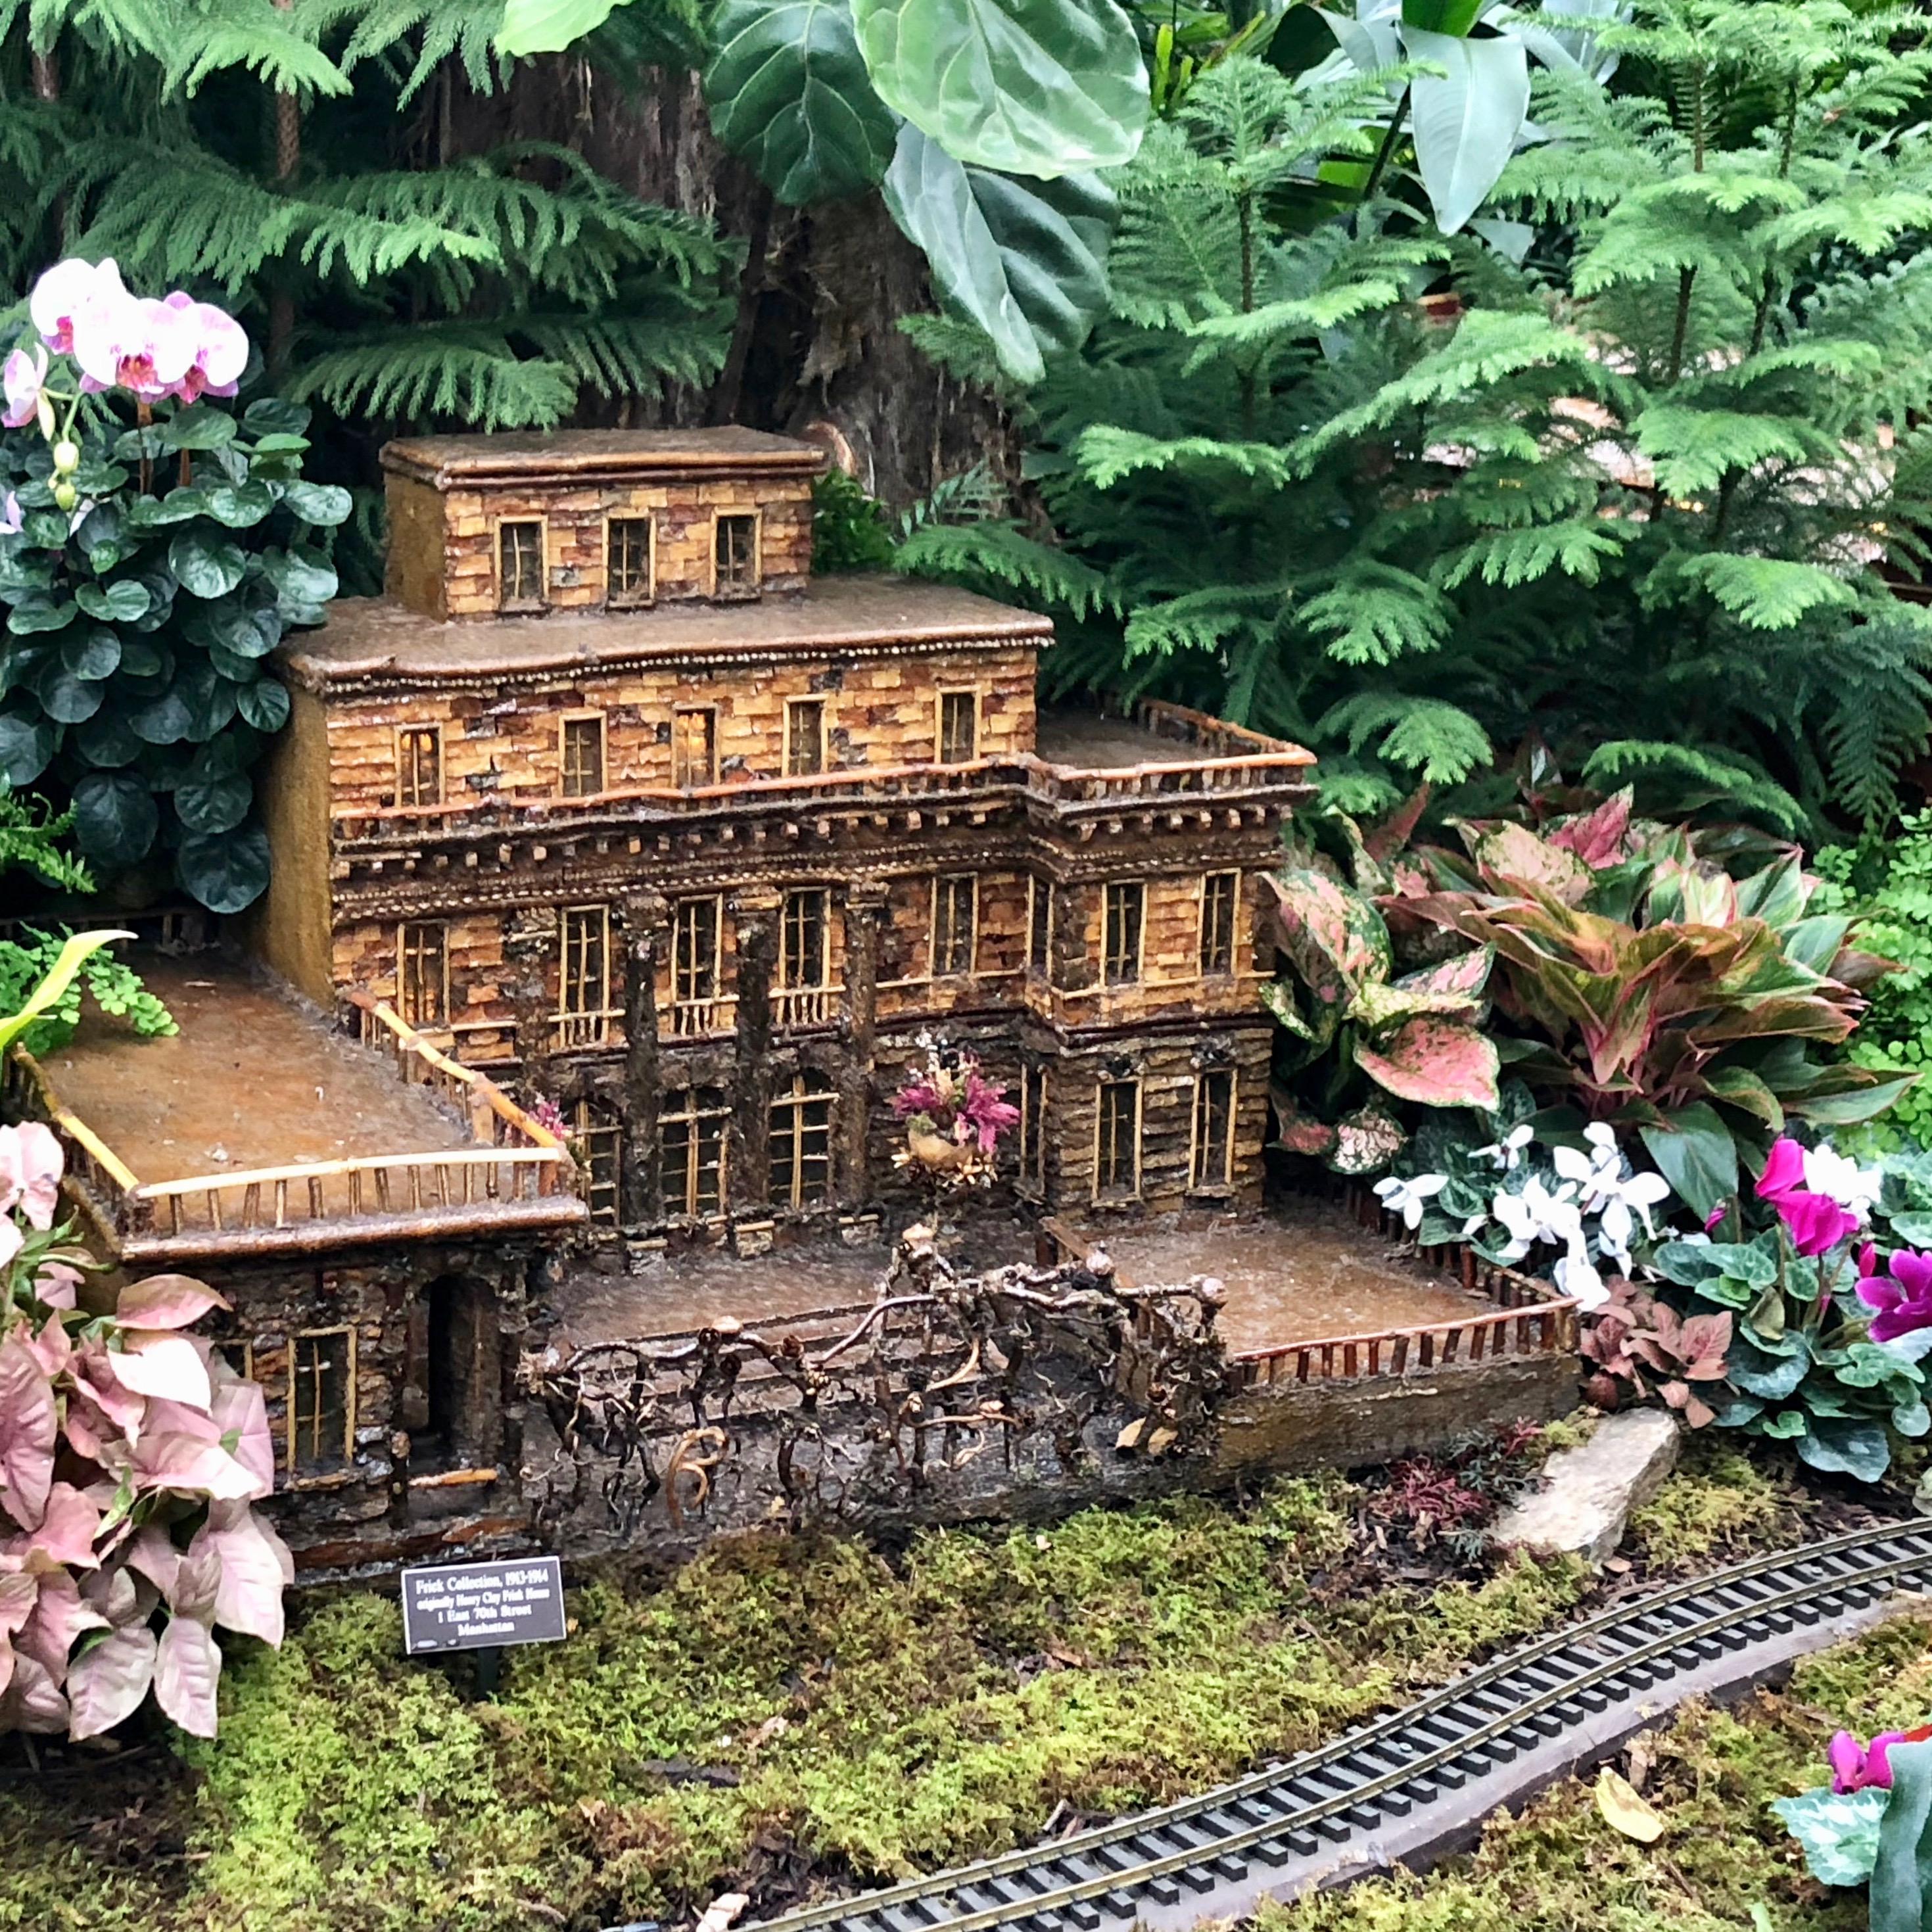 New york botanical garden holiday train show bmore energy - New york botanical garden train show ...